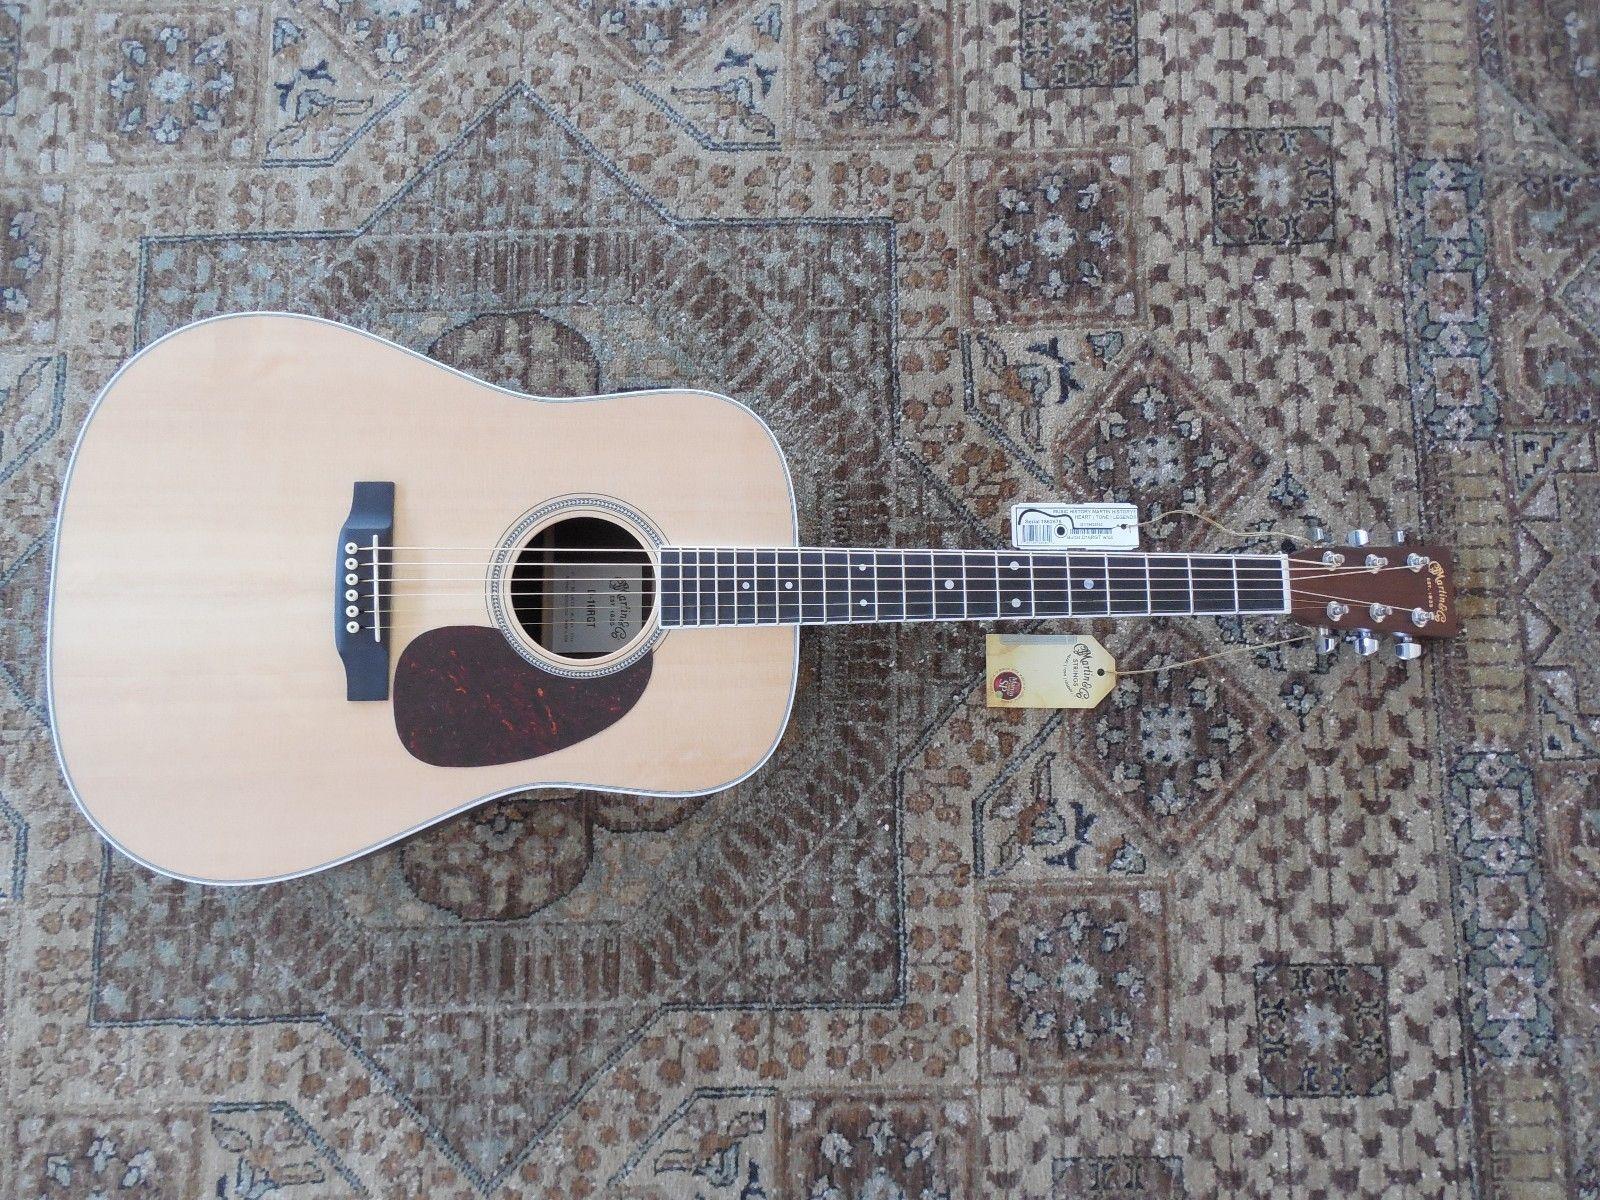 2015 Martin D16rgt With Hardshell Case Free Pro Setup And Humidification System Setup Humidification System Free Case Wi Guitar Acoustic Guitar Acoustic